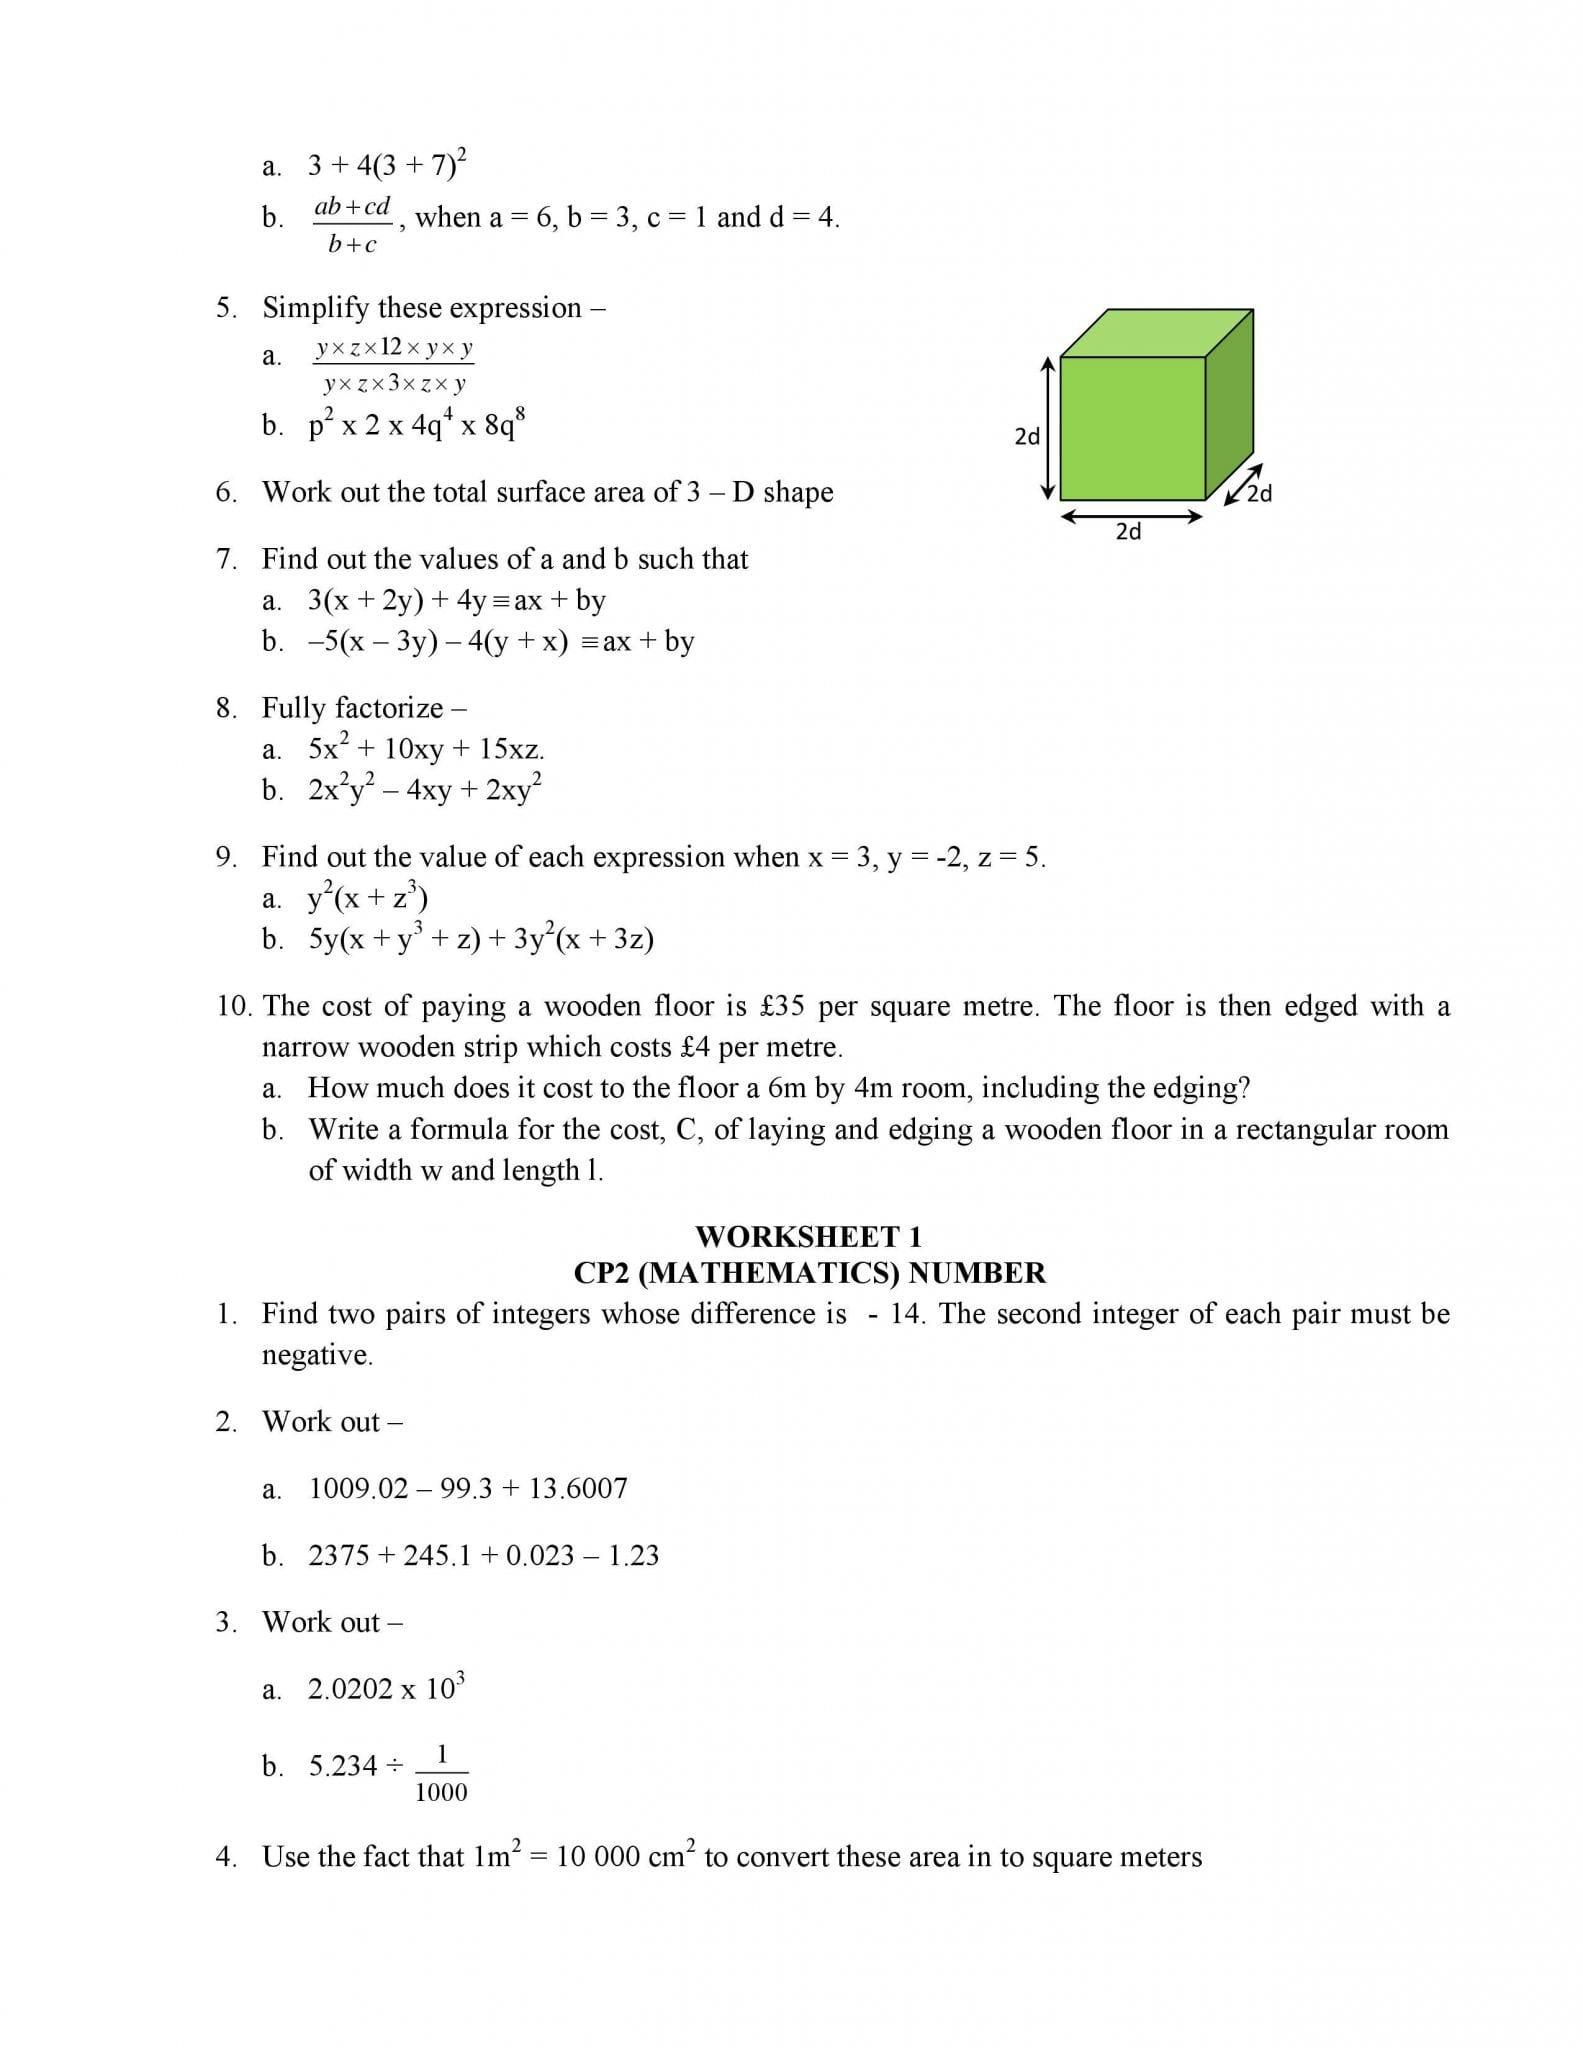 Algebra 1 Worksheet 15 Translating Expressions Answer Key